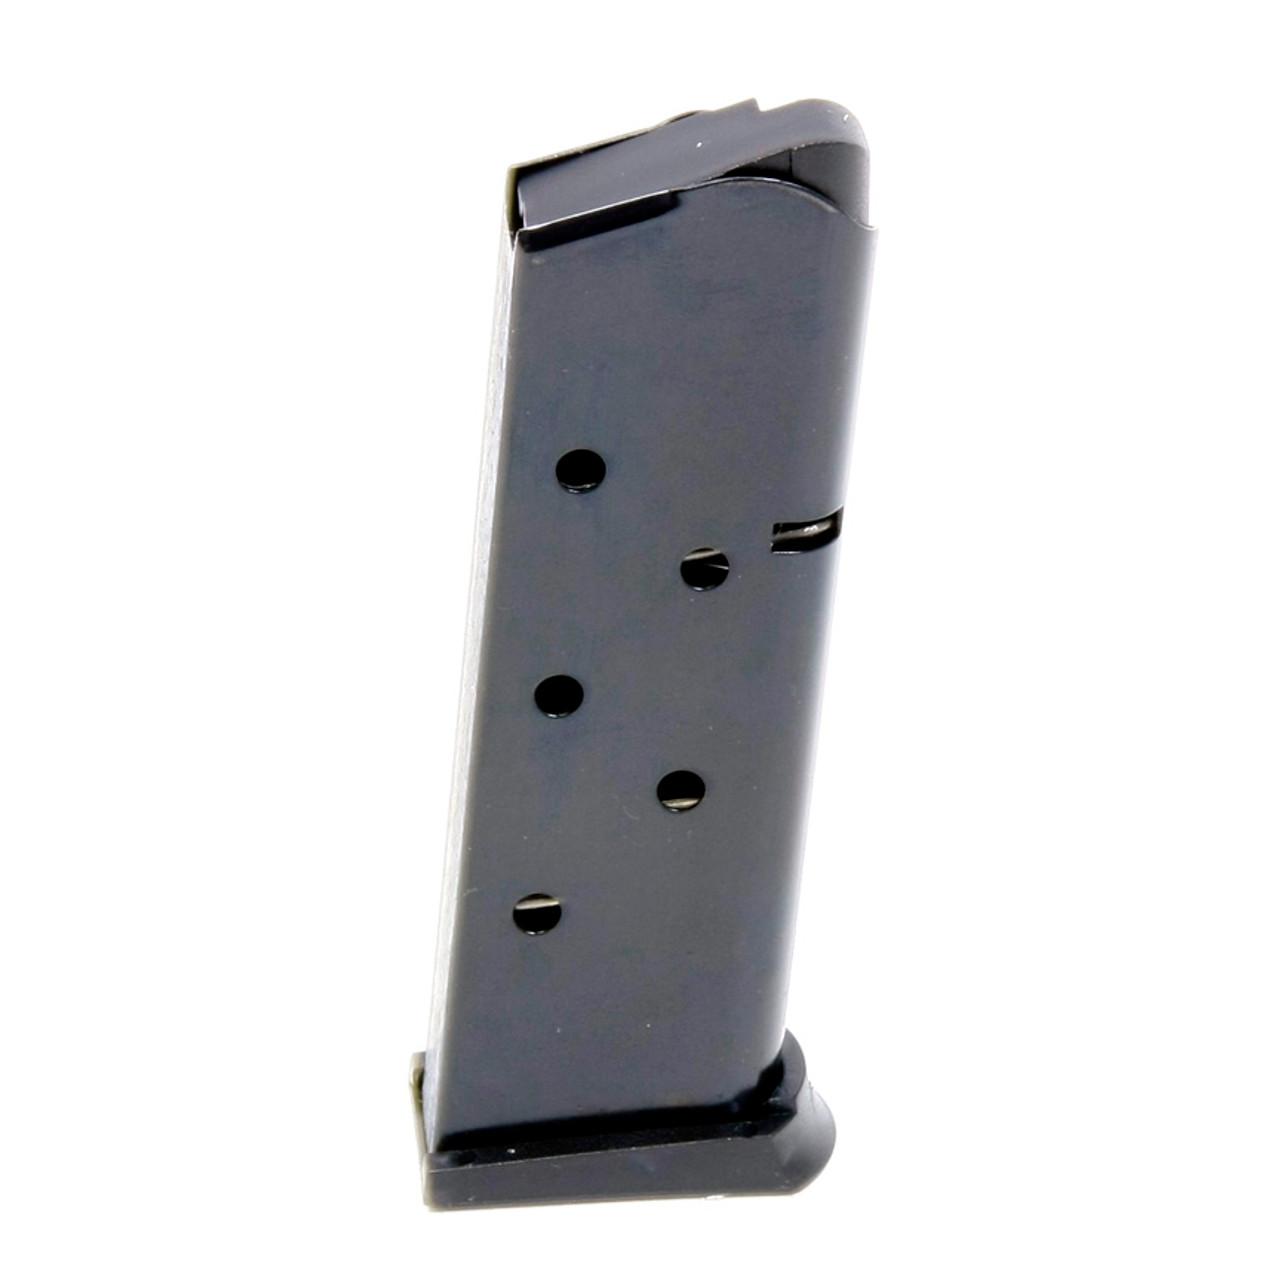 Colt® 1911 Defender™ .45 ACP (7) Rd - Blue Steel